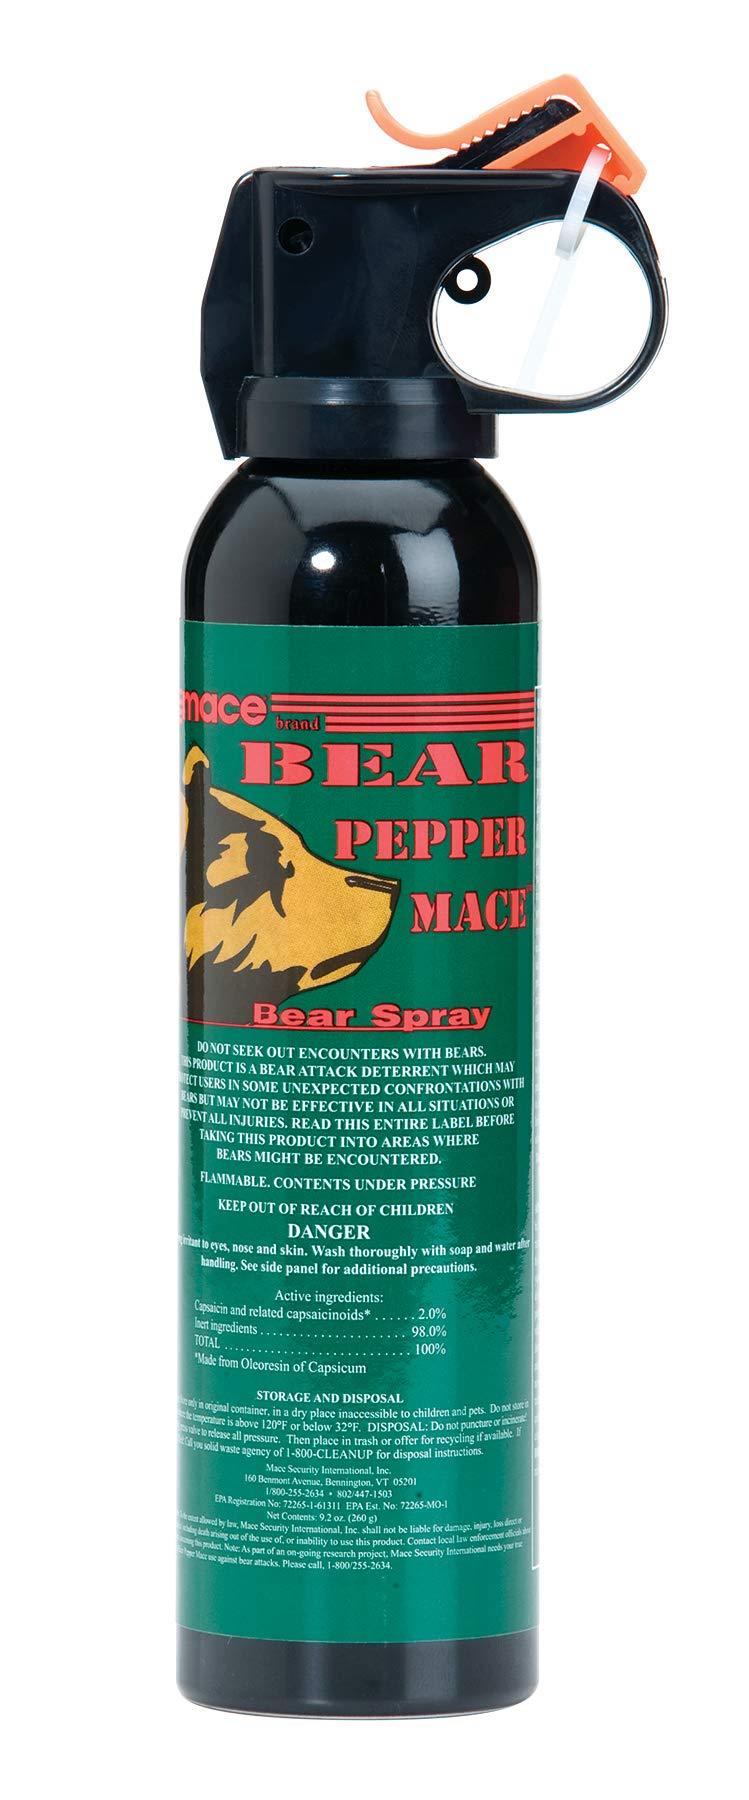 Mace Brand Maximum Strength Bear Spray, Bear Defense Pepper Mace for Camping and Hiking, 35' Spray Range,  9'' x 2'' (80346) by Mace